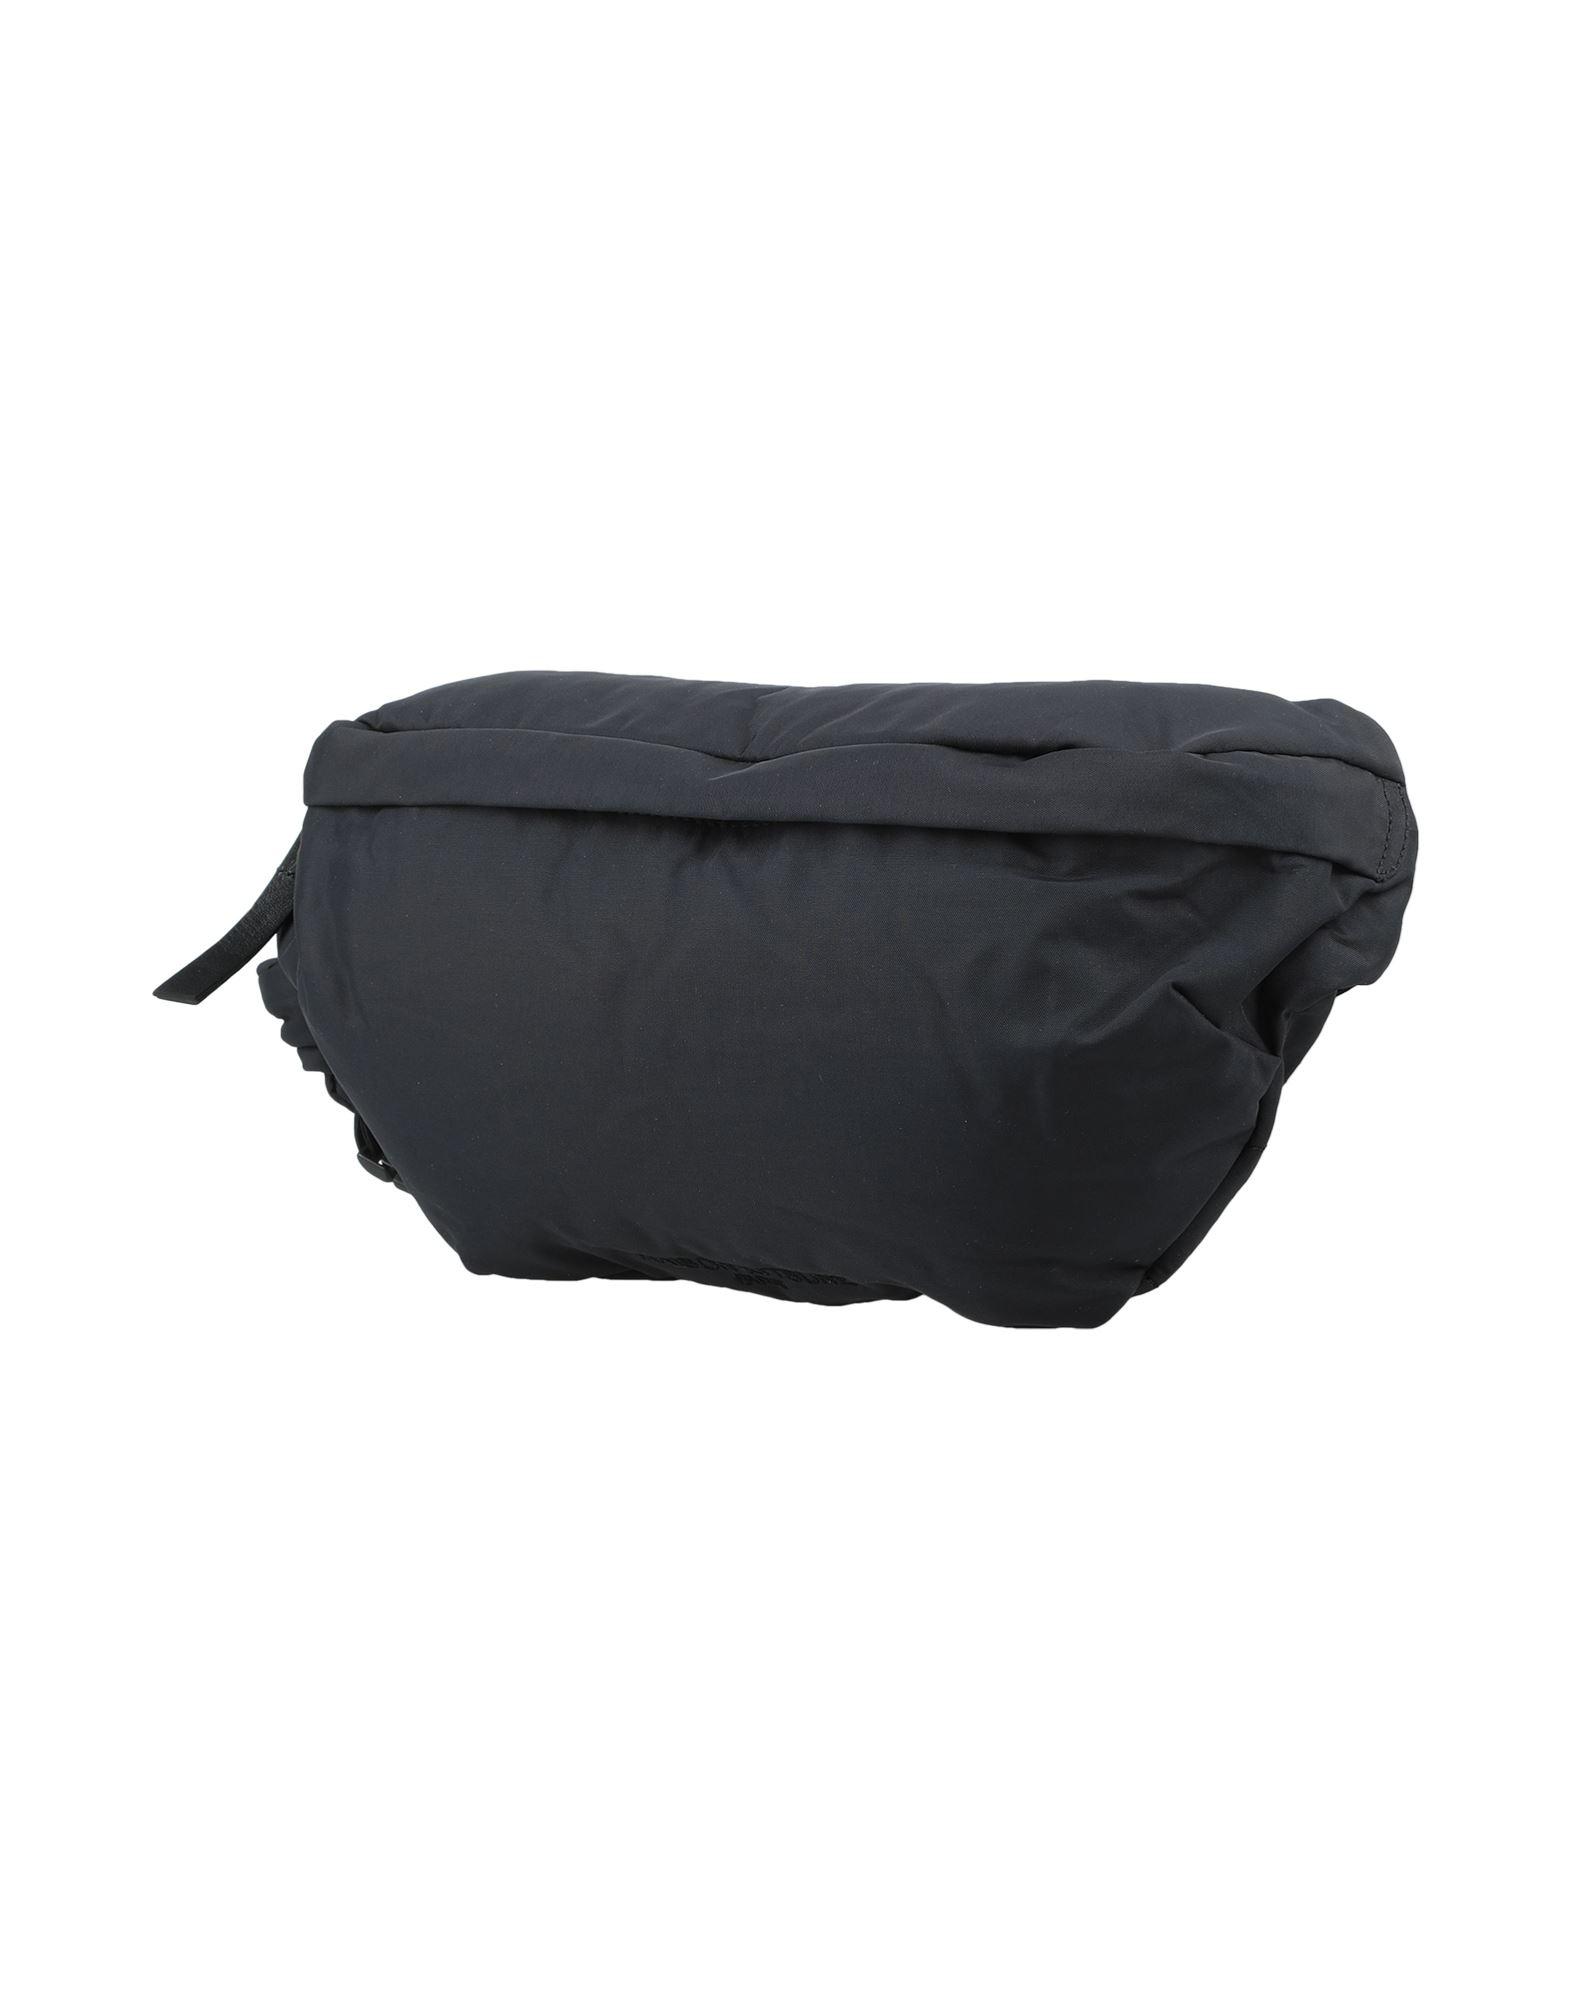 Фото - MAISON KITSUNÉ Поясная сумка maison kitsuné чехол